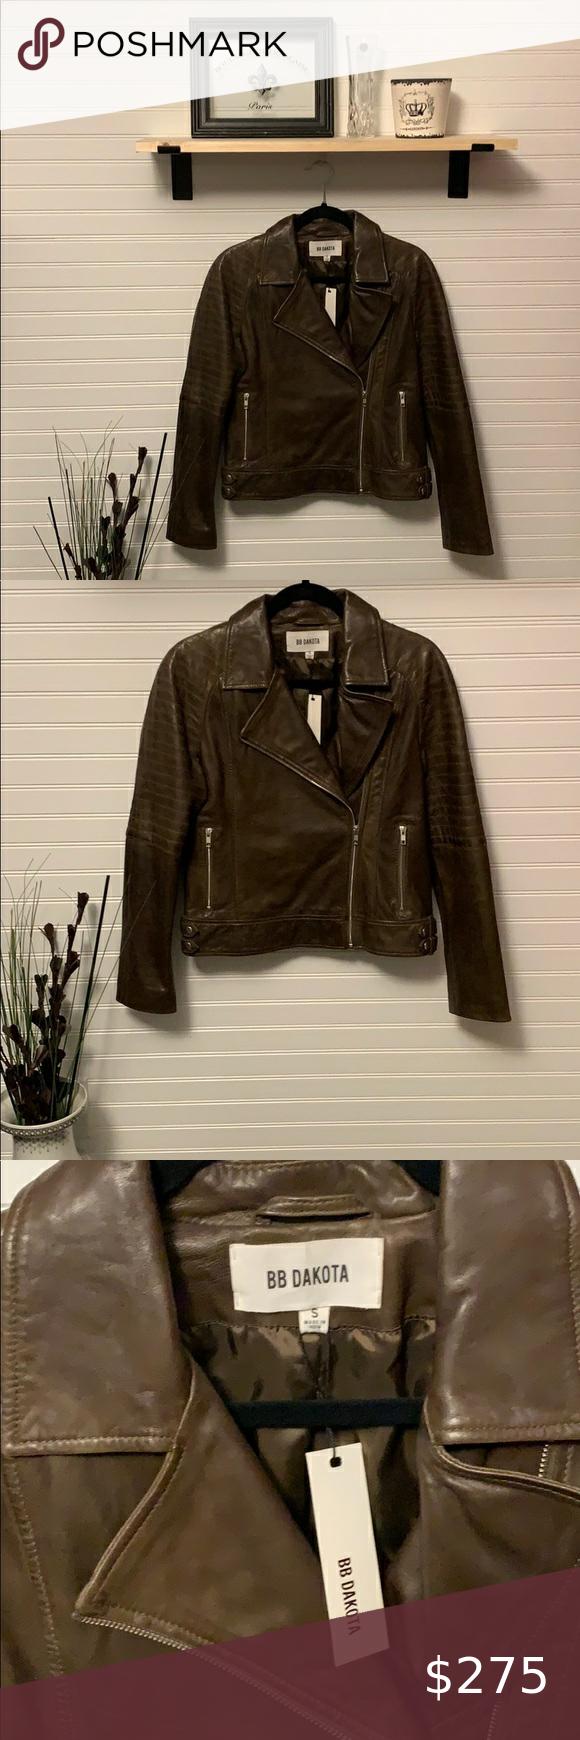 Bb Dakota Leather Biker Jacket Leather Biker Jacket Jackets Biker Jacket [ 1740 x 580 Pixel ]